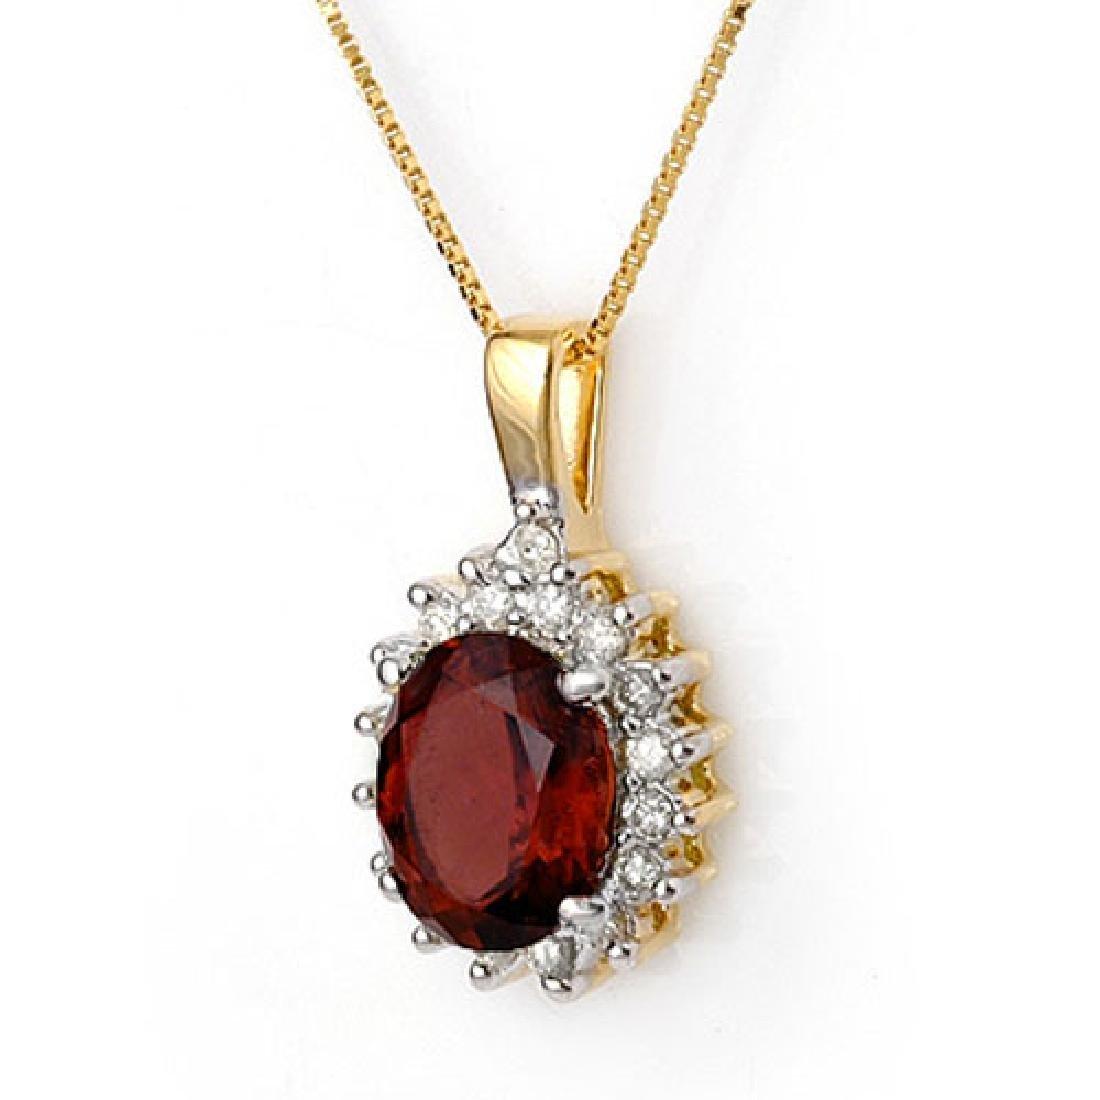 3.45 CTW Pink Tourmaline & Diamond Necklace 14K Yellow